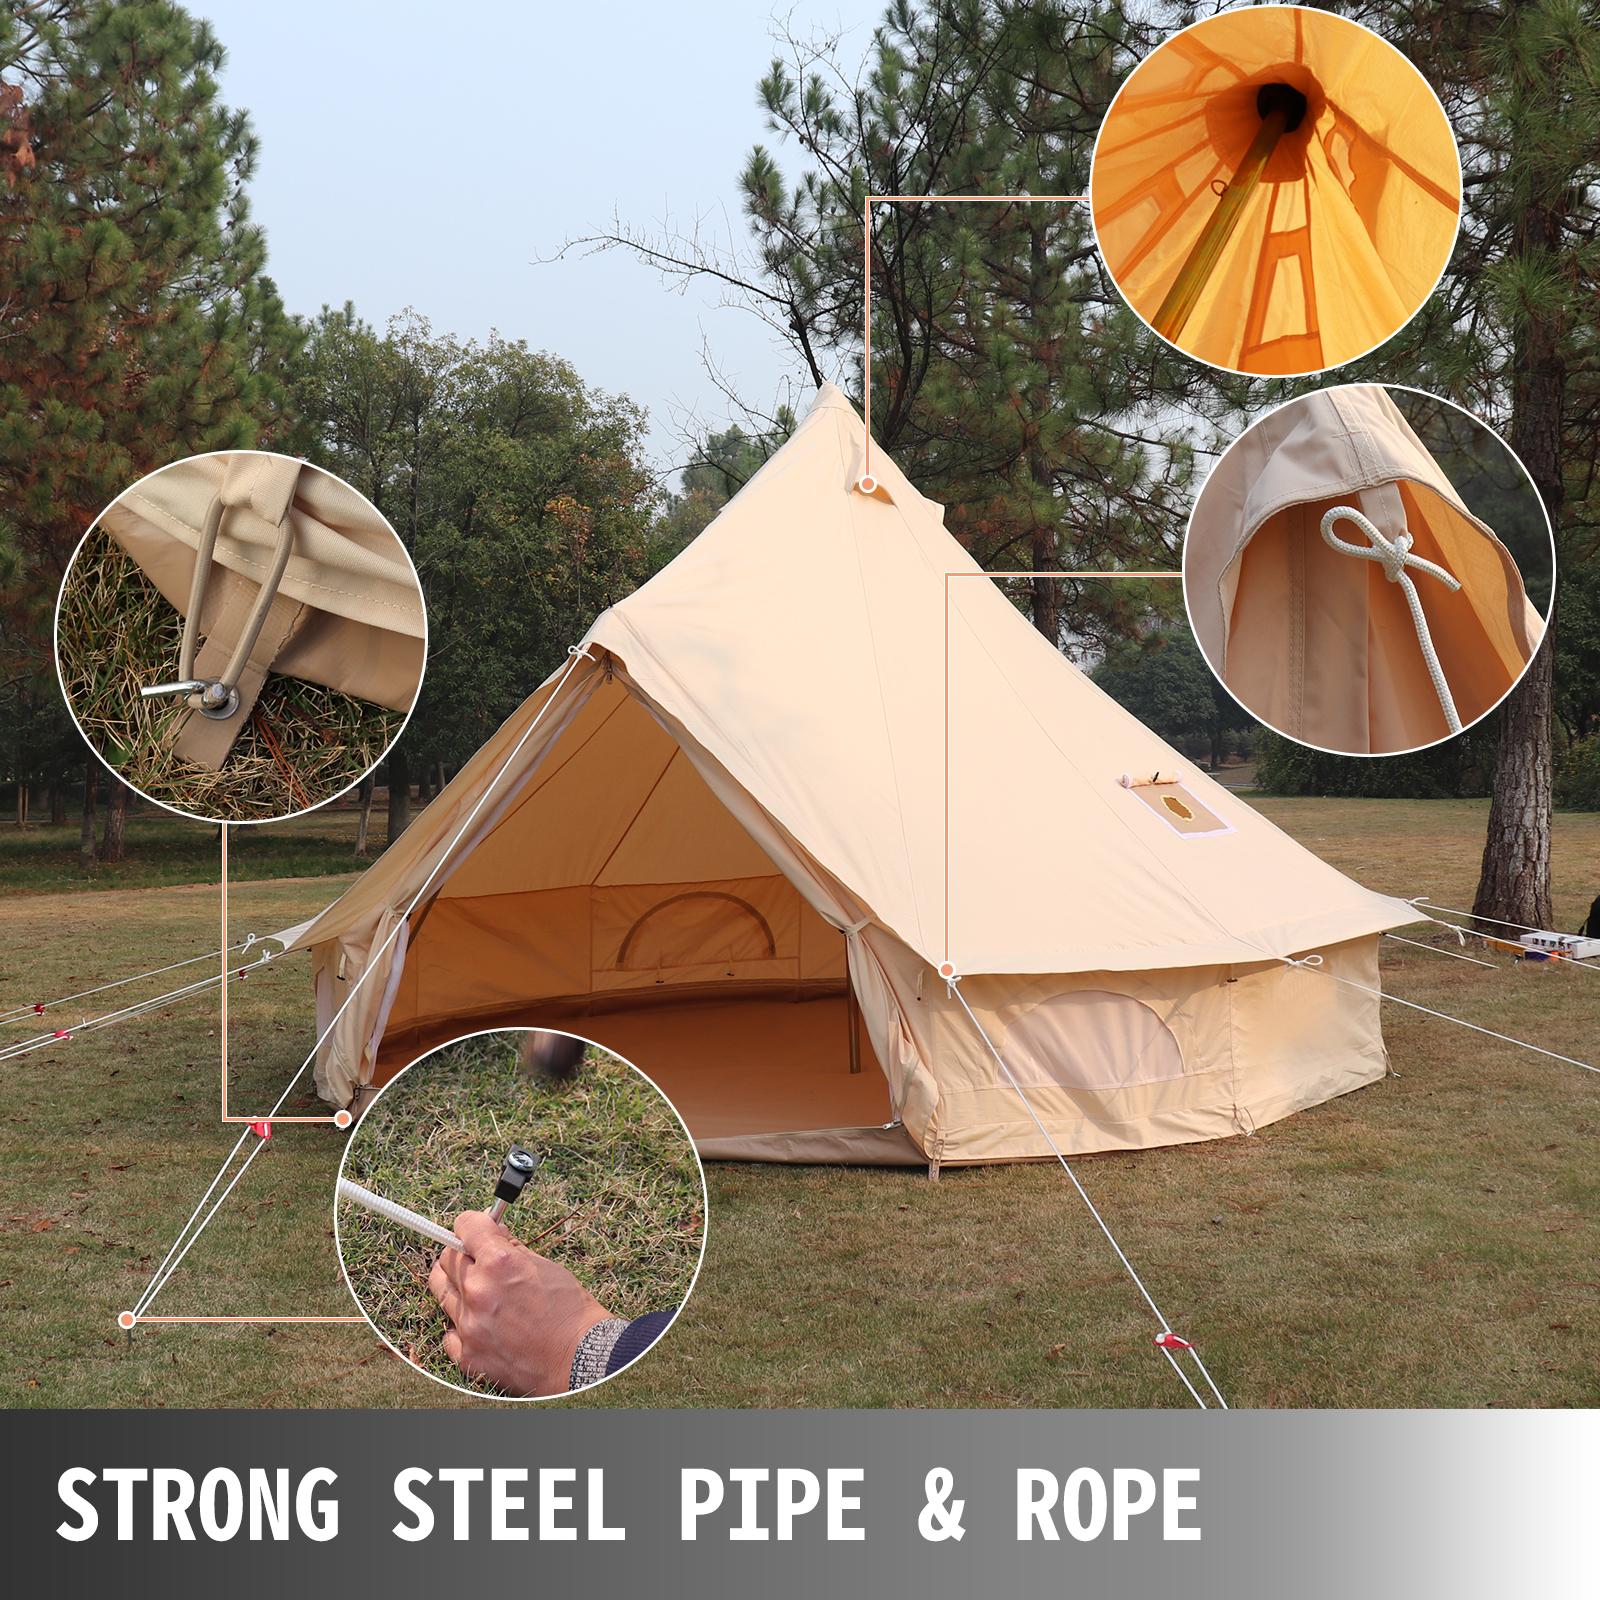 4-Season-Bell-Tent-3-4-5-6M-Waterproof-Cotton-Canvas-Glamping-Camping-Beach-US thumbnail 17